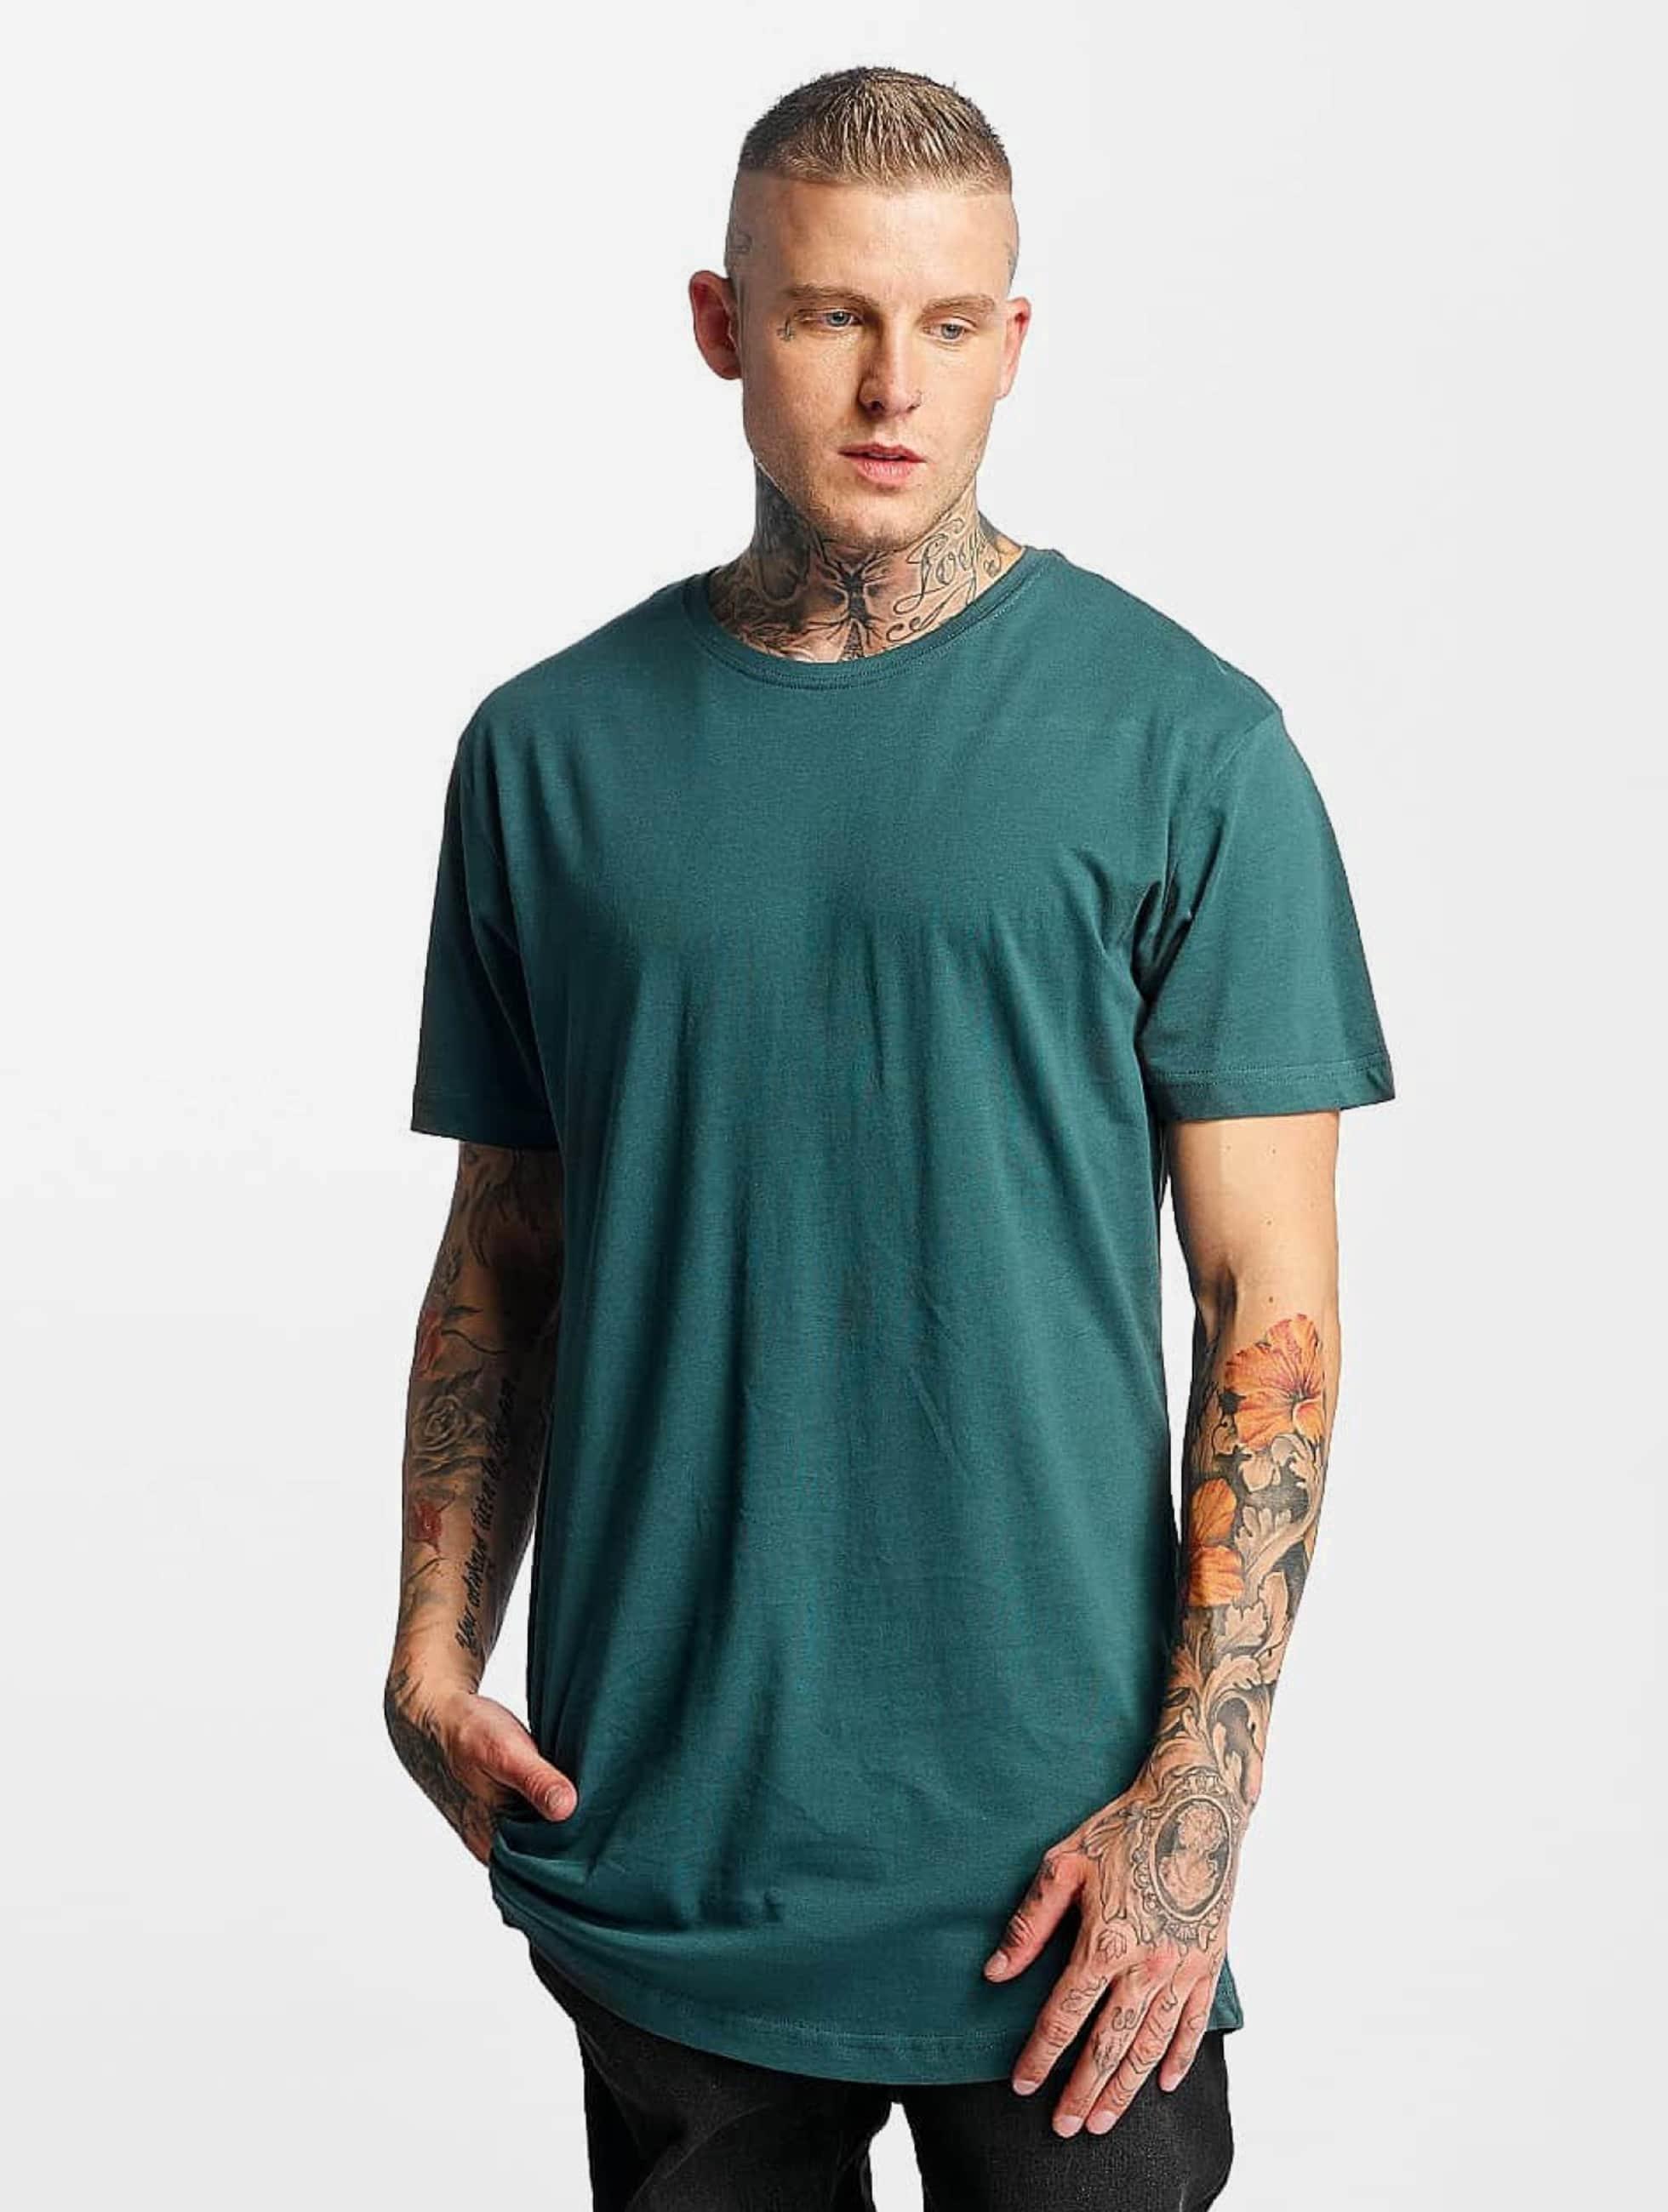 Urban Classics Tall Tees Shaped Long turquoise